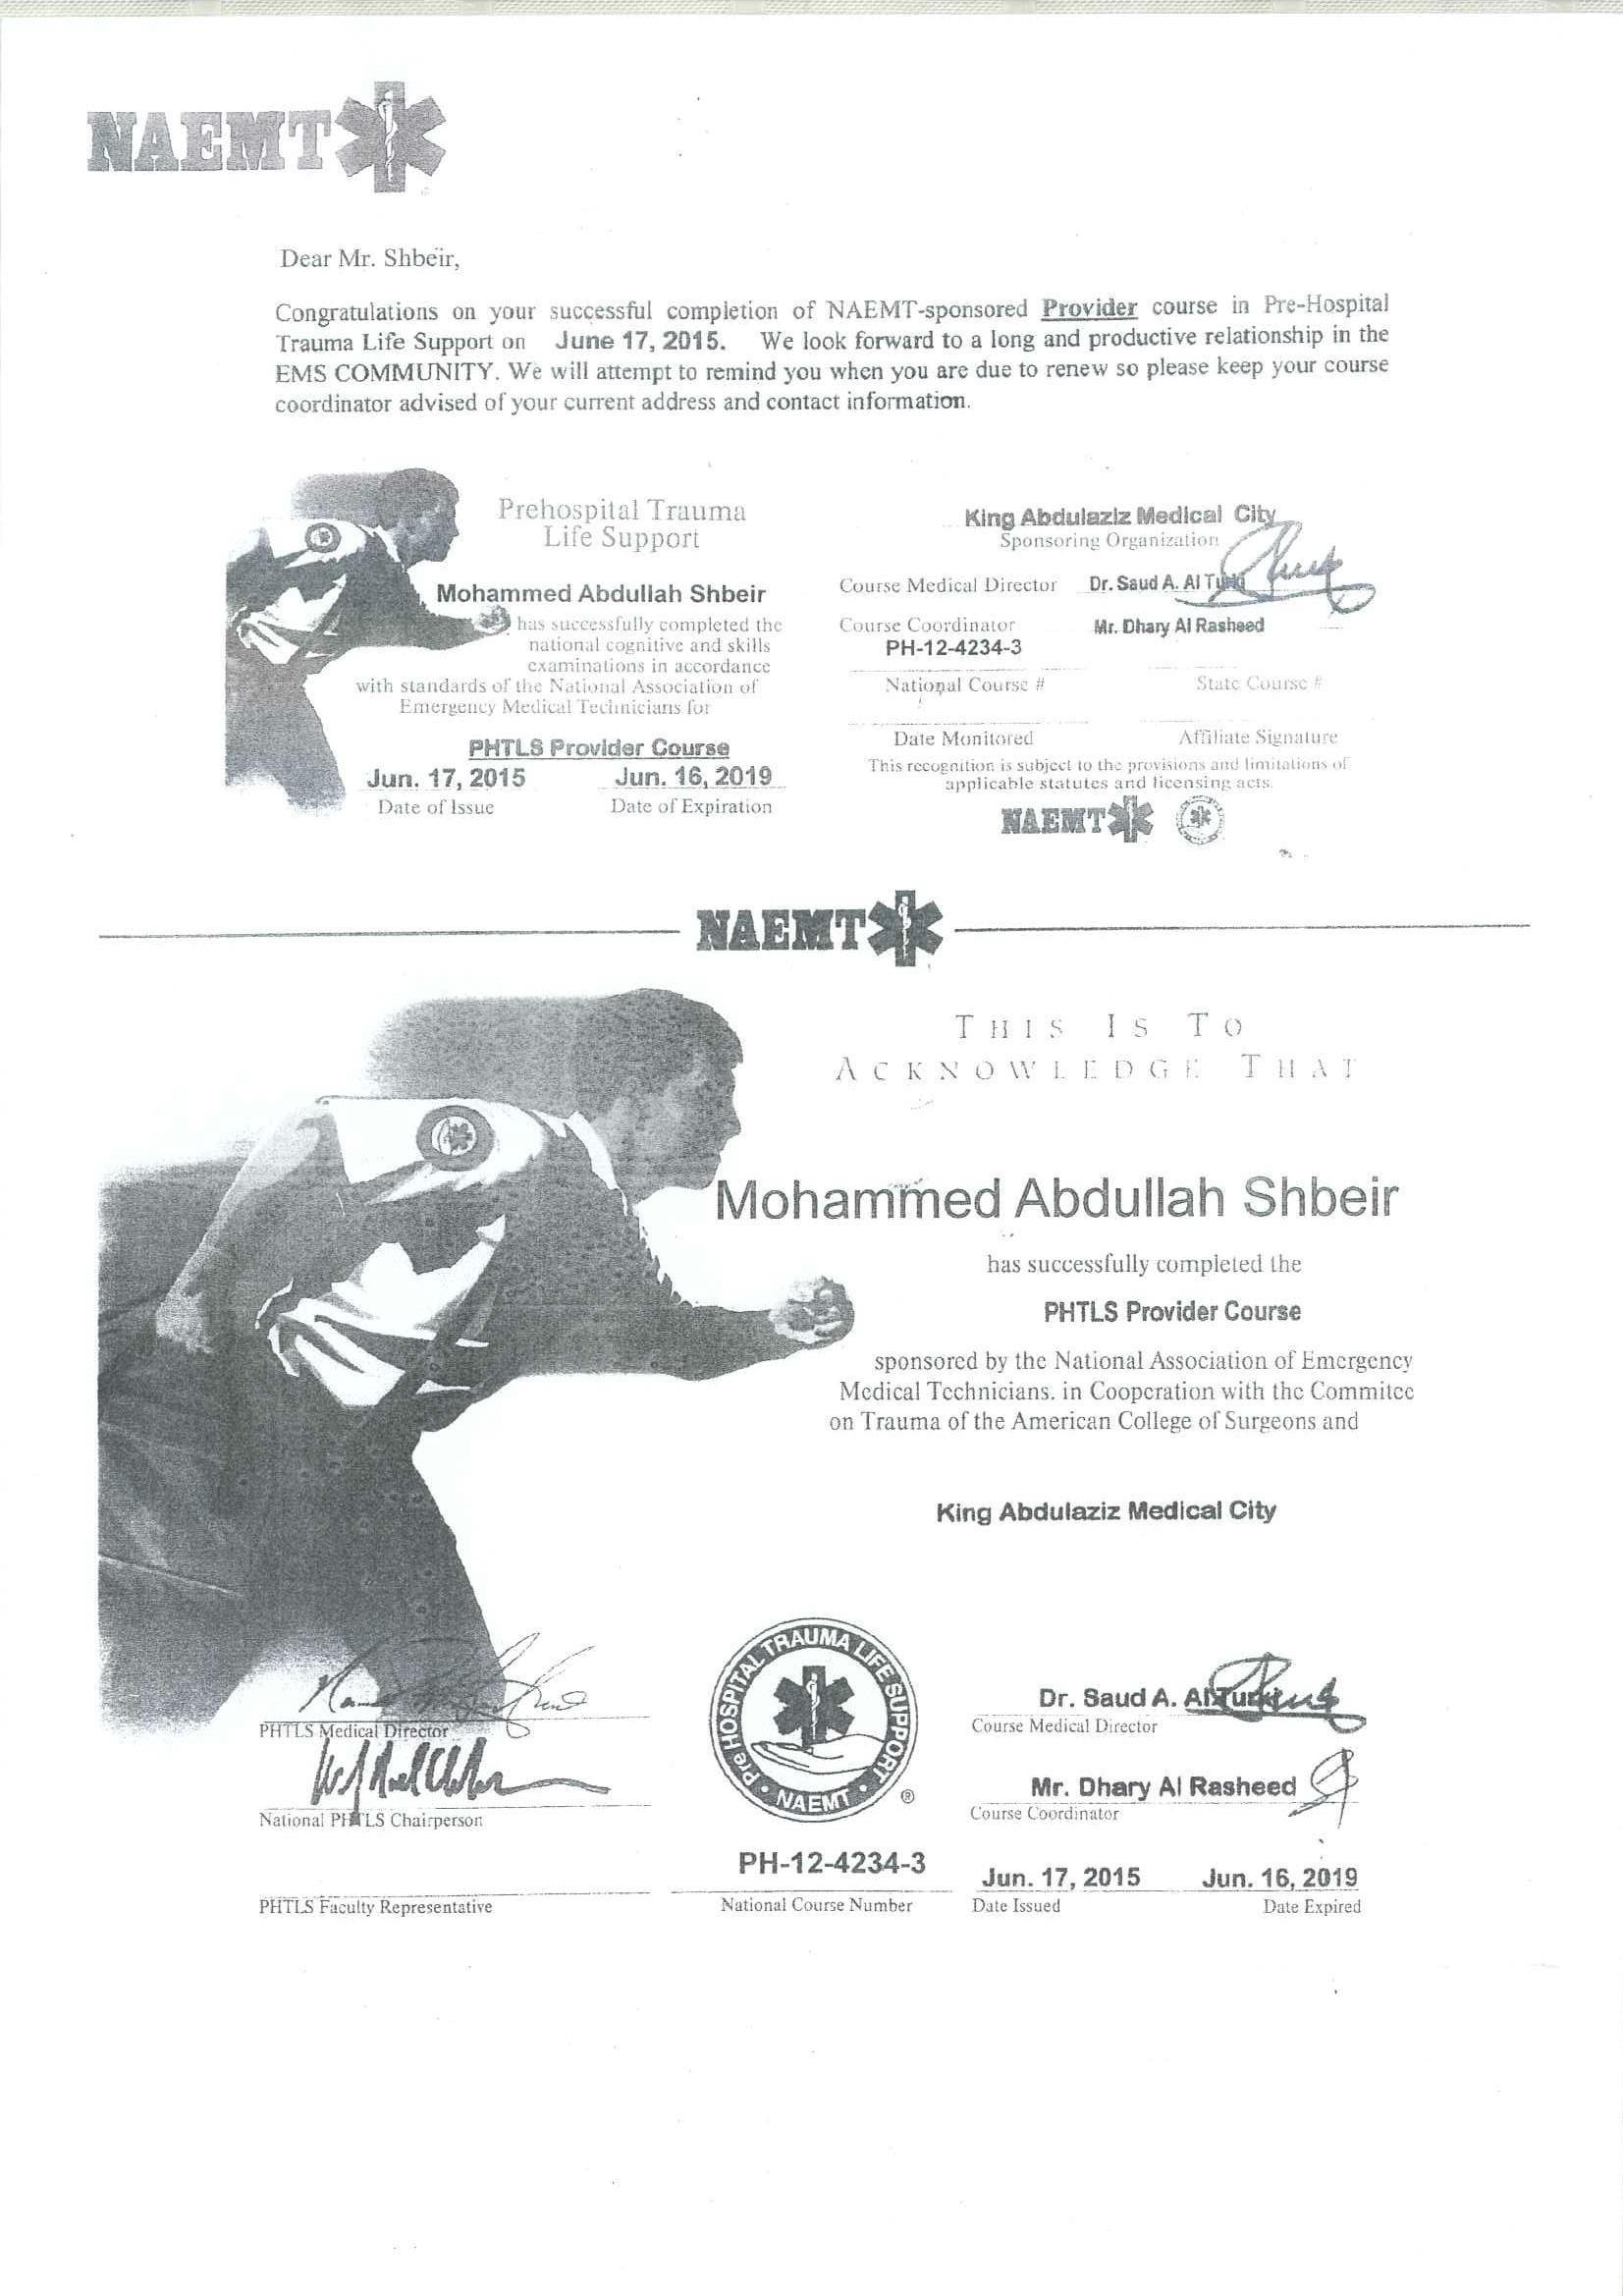 Mohammed Abdullah Shbeir Bayt